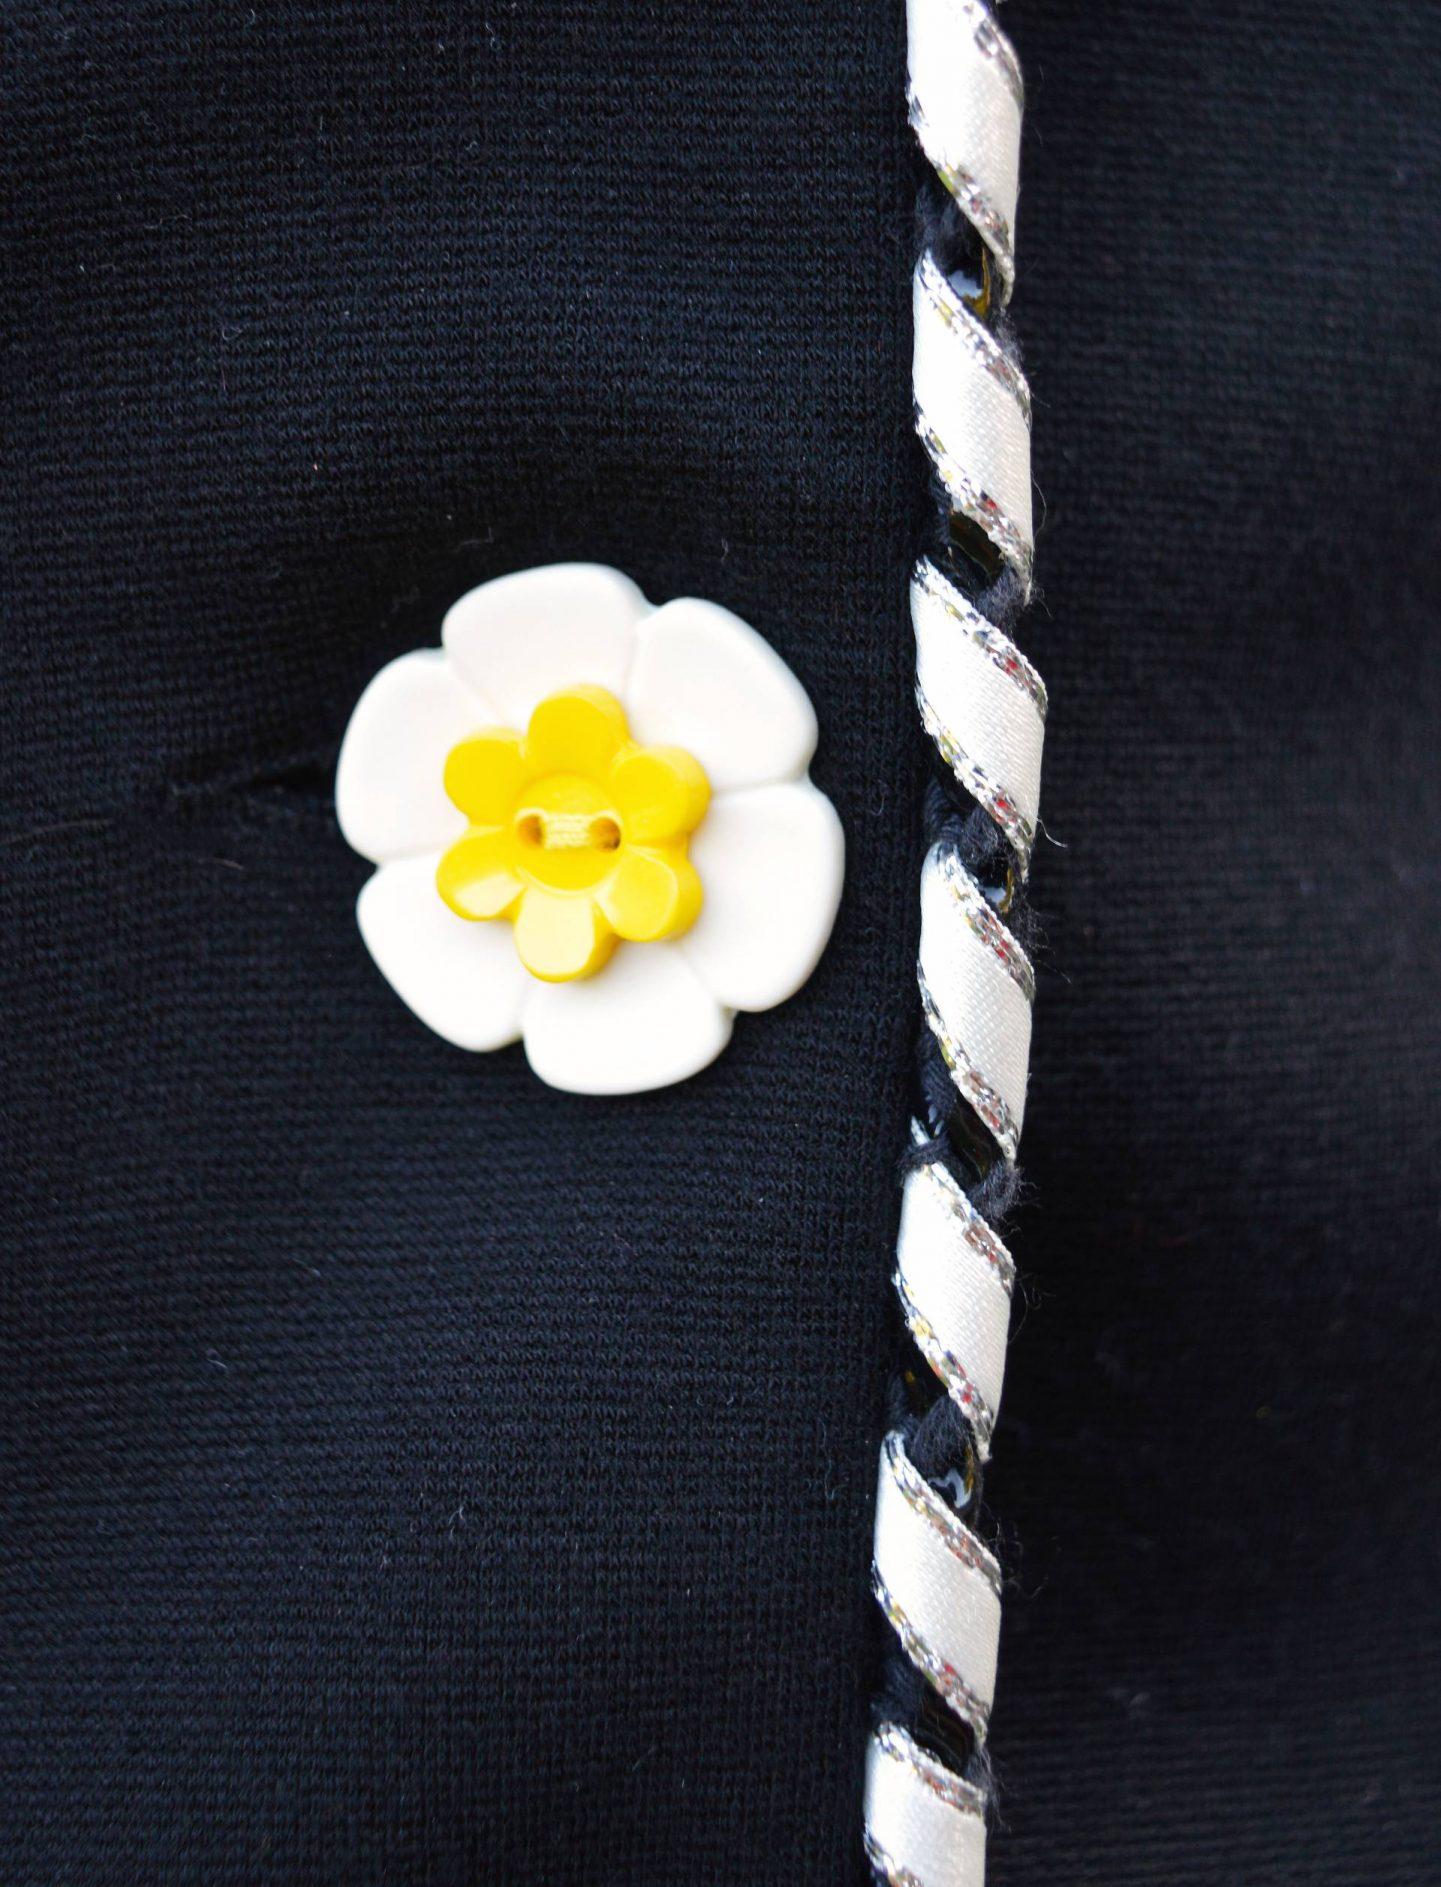 close up of flower button on a black Marks & Spencer jacket